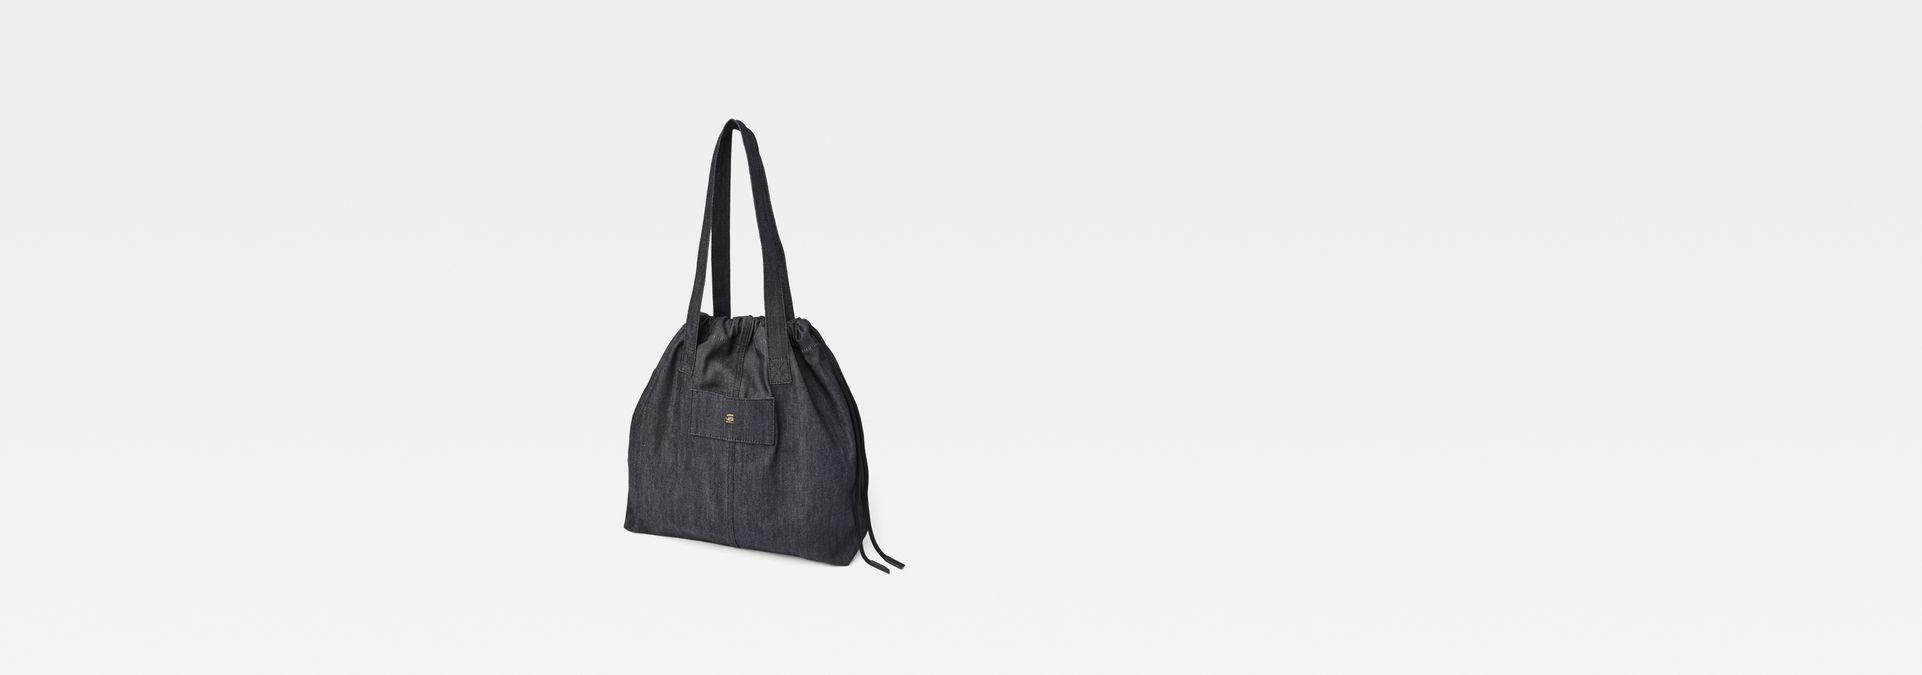 Luza Bag Denim by G Star